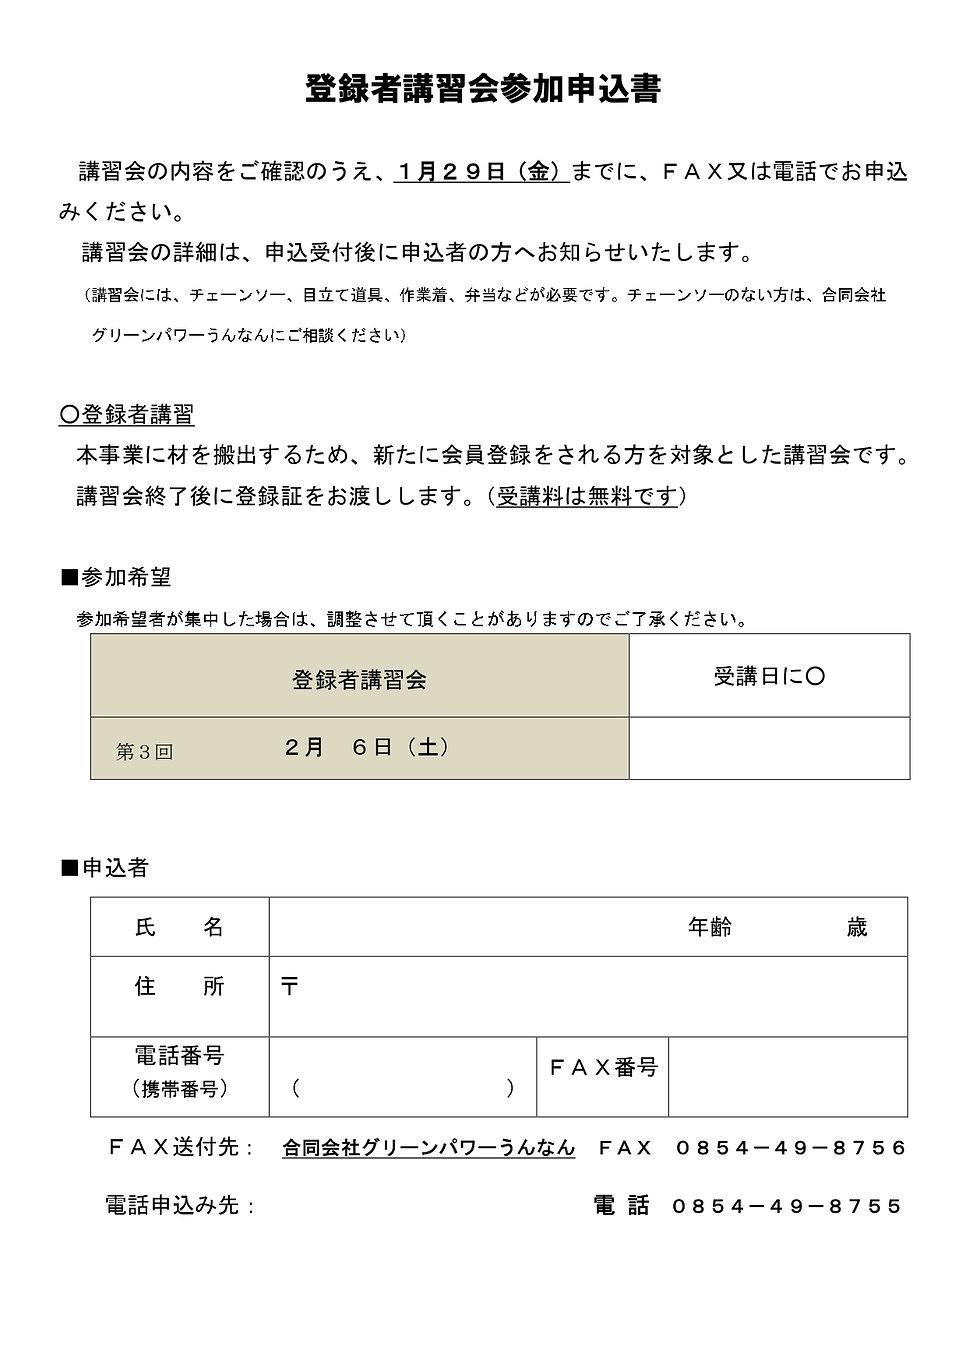 R2年度登録者講習案内(市民向け)_2月6日_page-0002.jpg